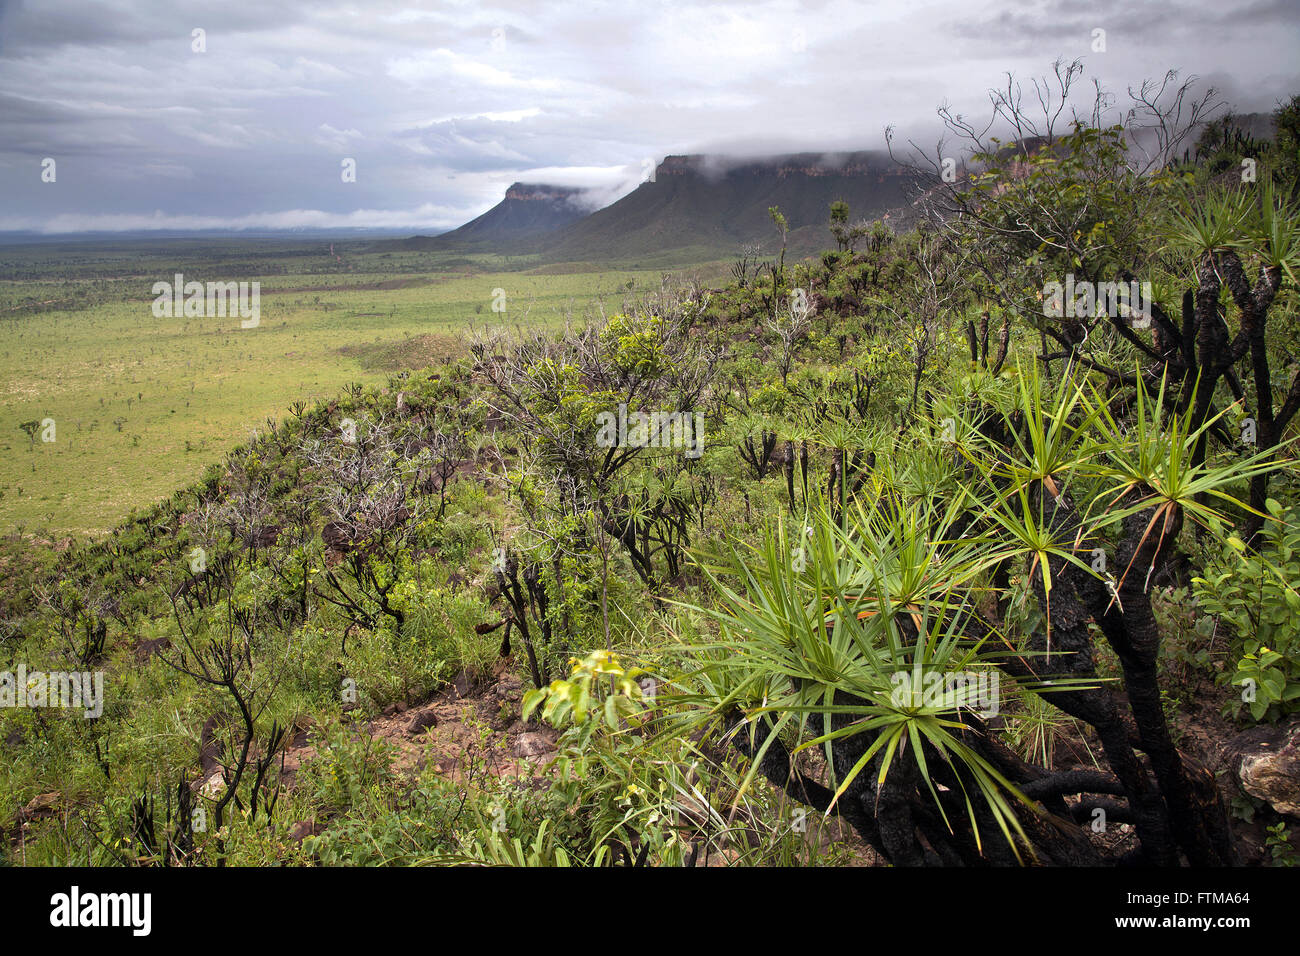 Savannah vegetation on the slopes of the Sierra of the Holy Spirit - Jalapao - Stock Image